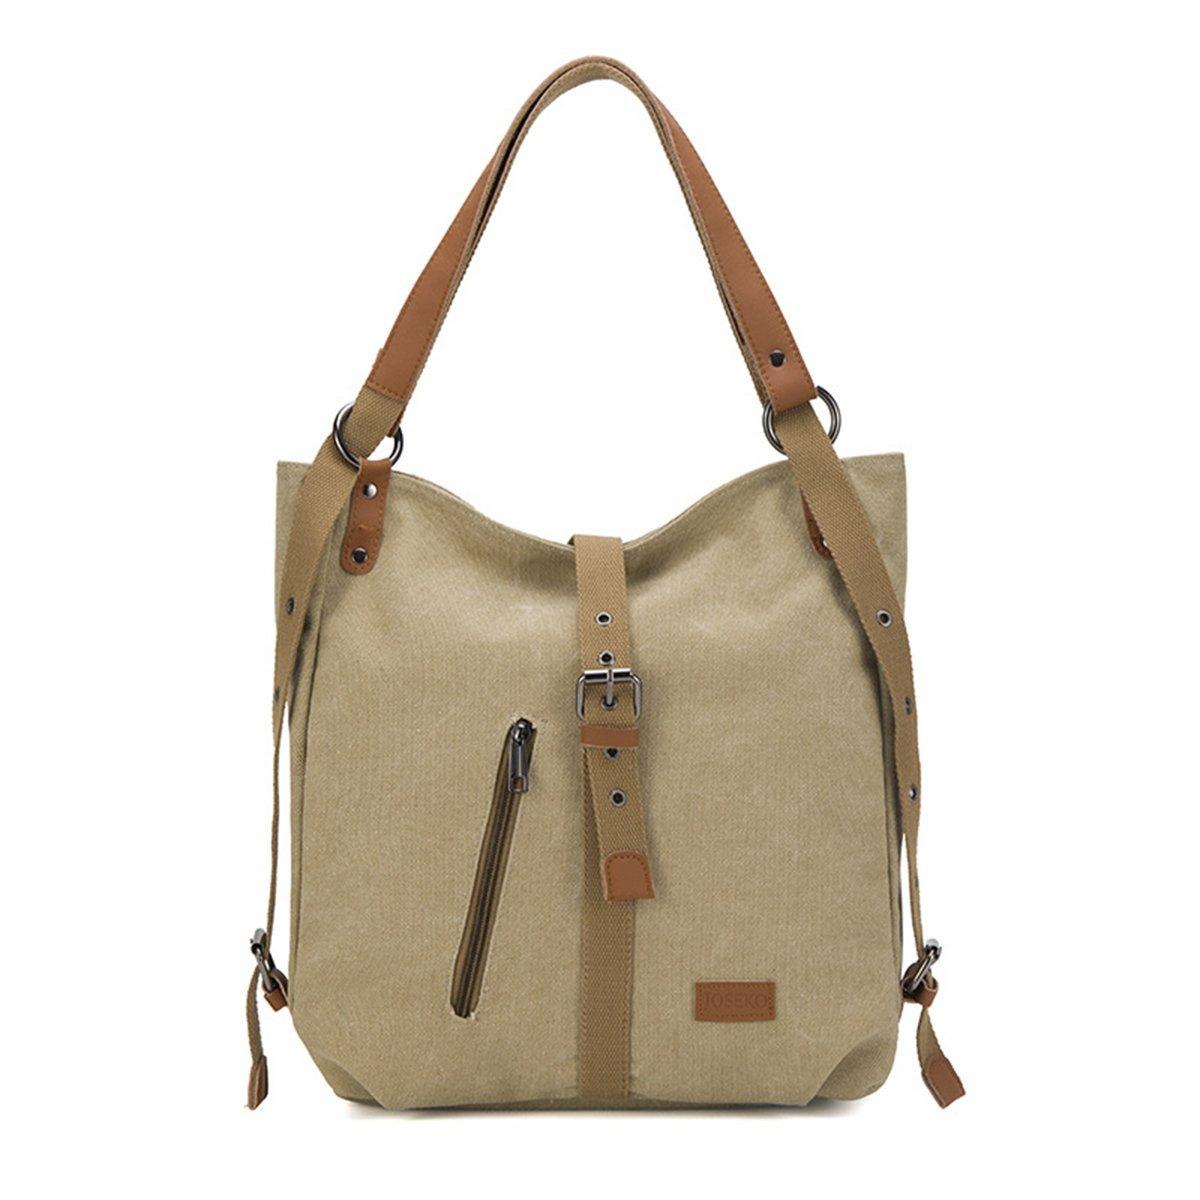 Evaliana Women Travel Canvas PU Leather Rucksack Backpack School Shoulder Bag